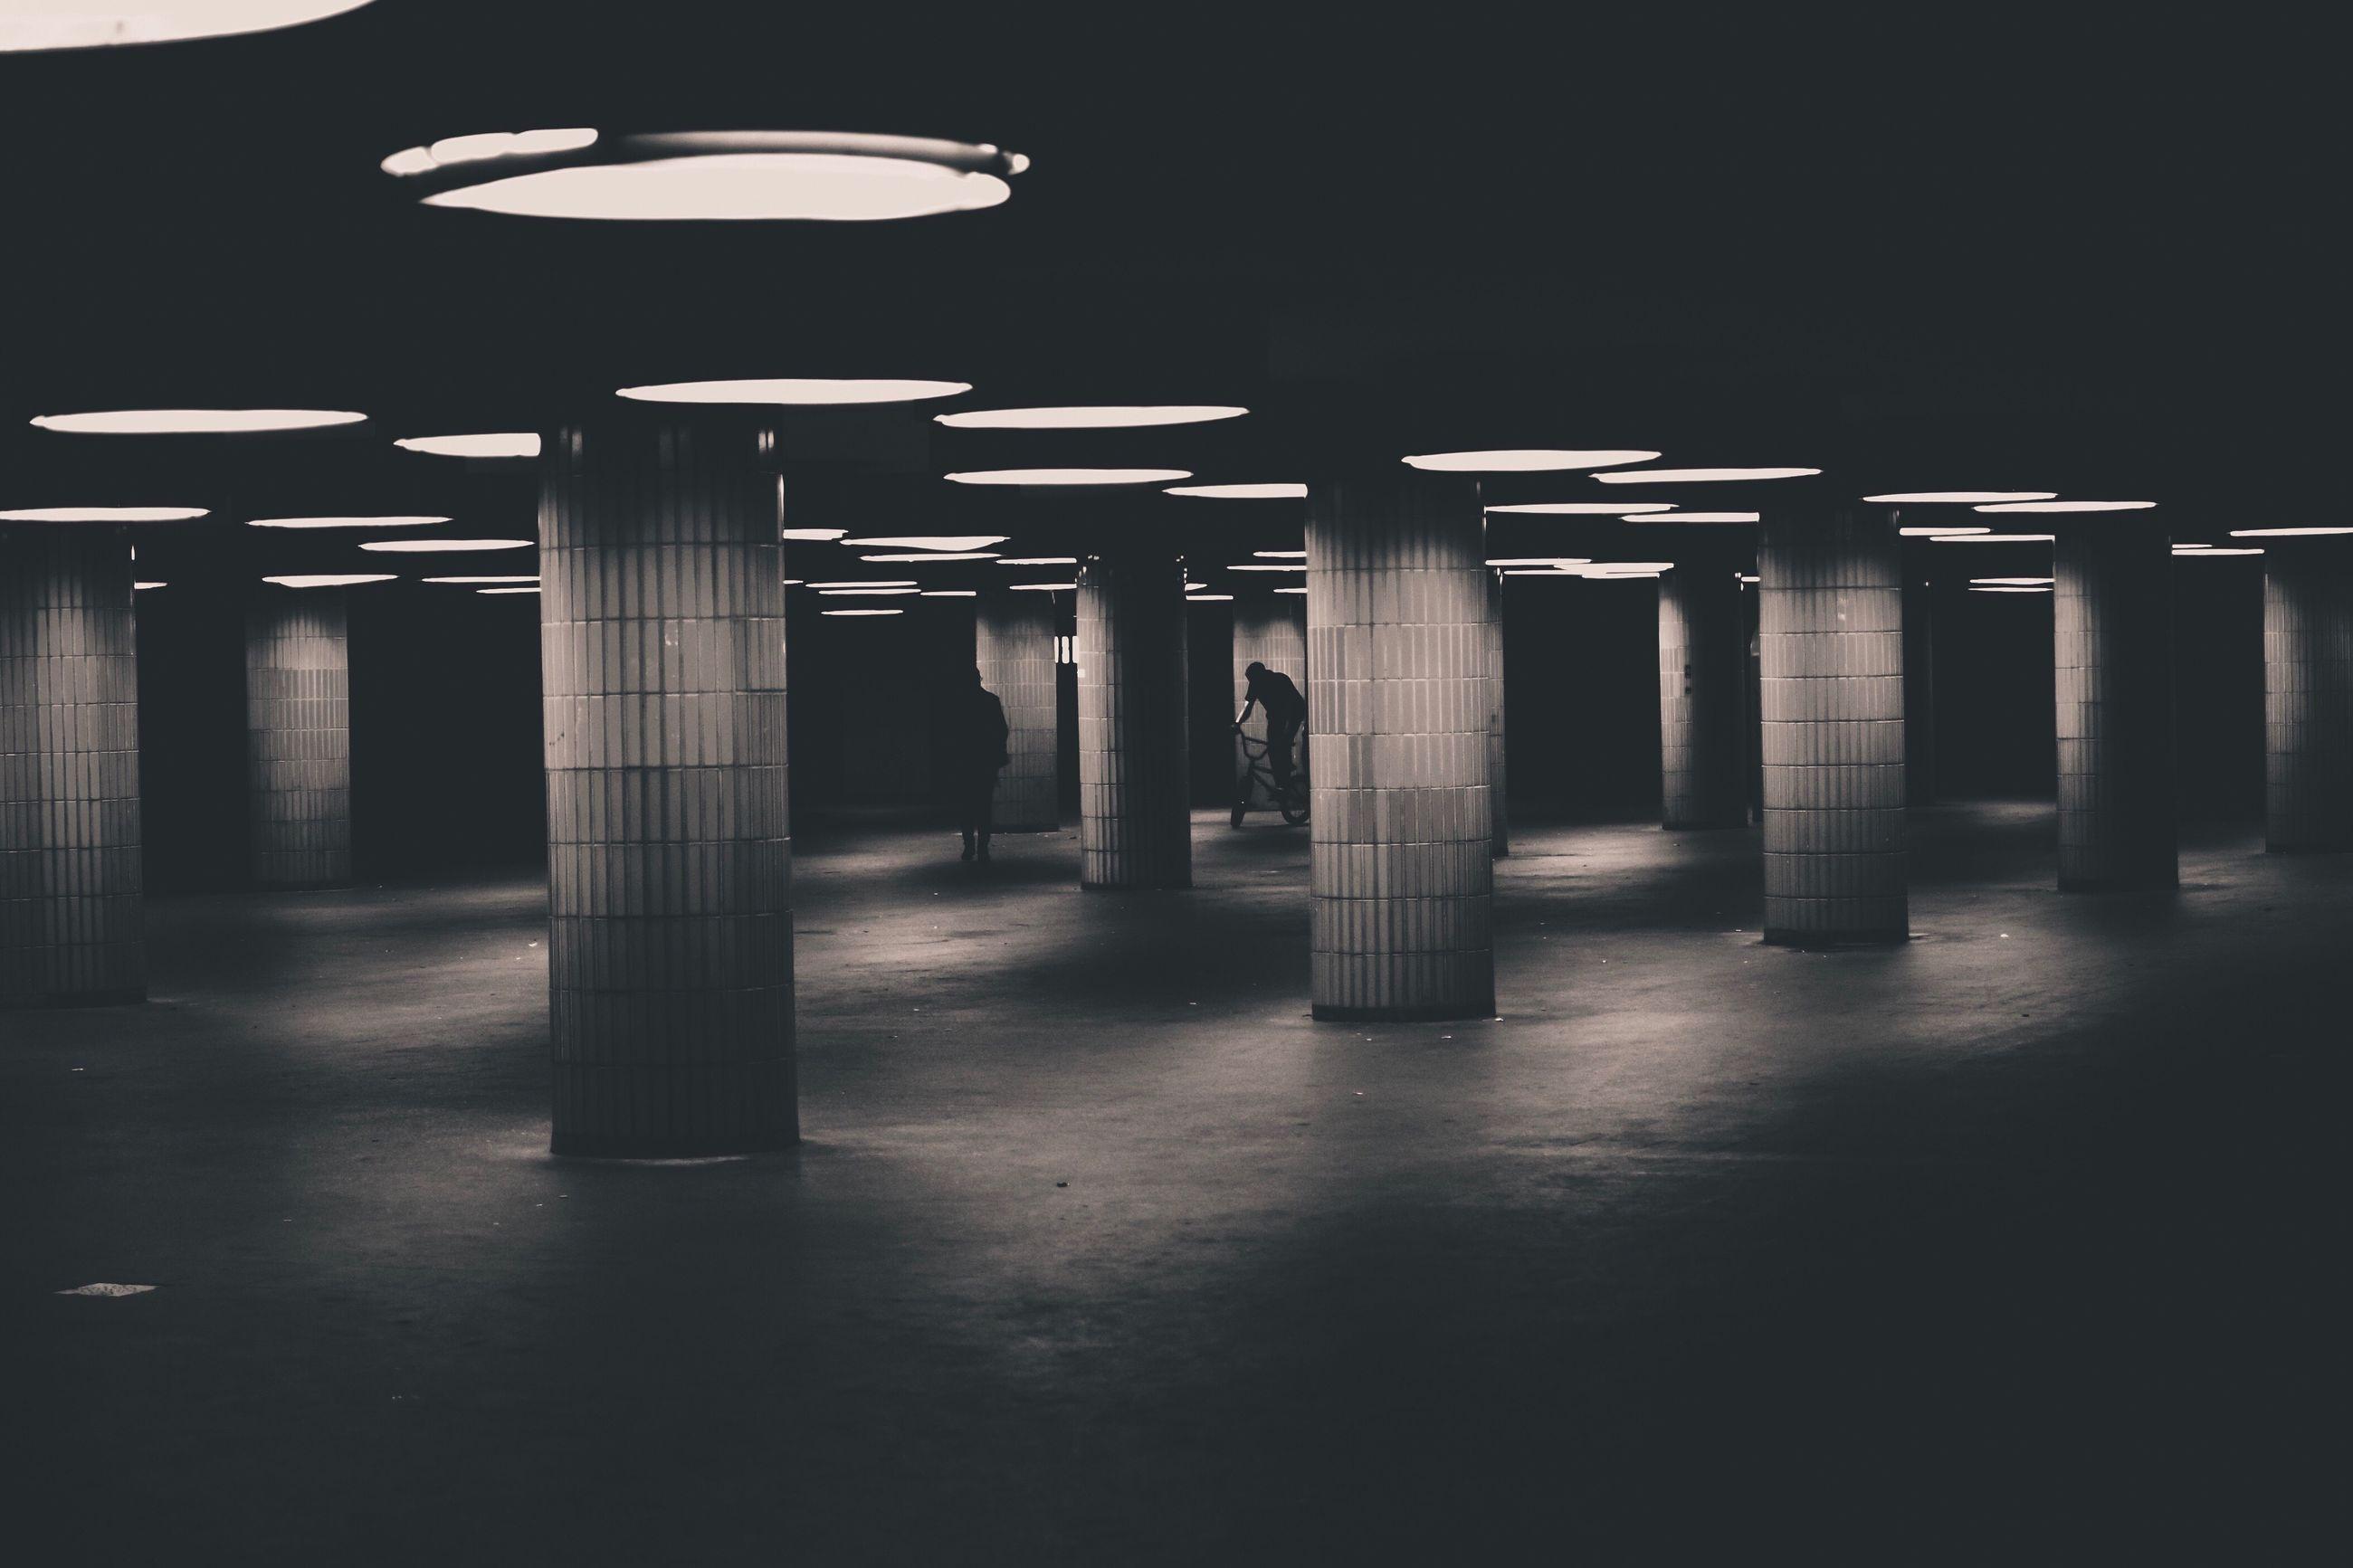 Interior of illuminated parking lot